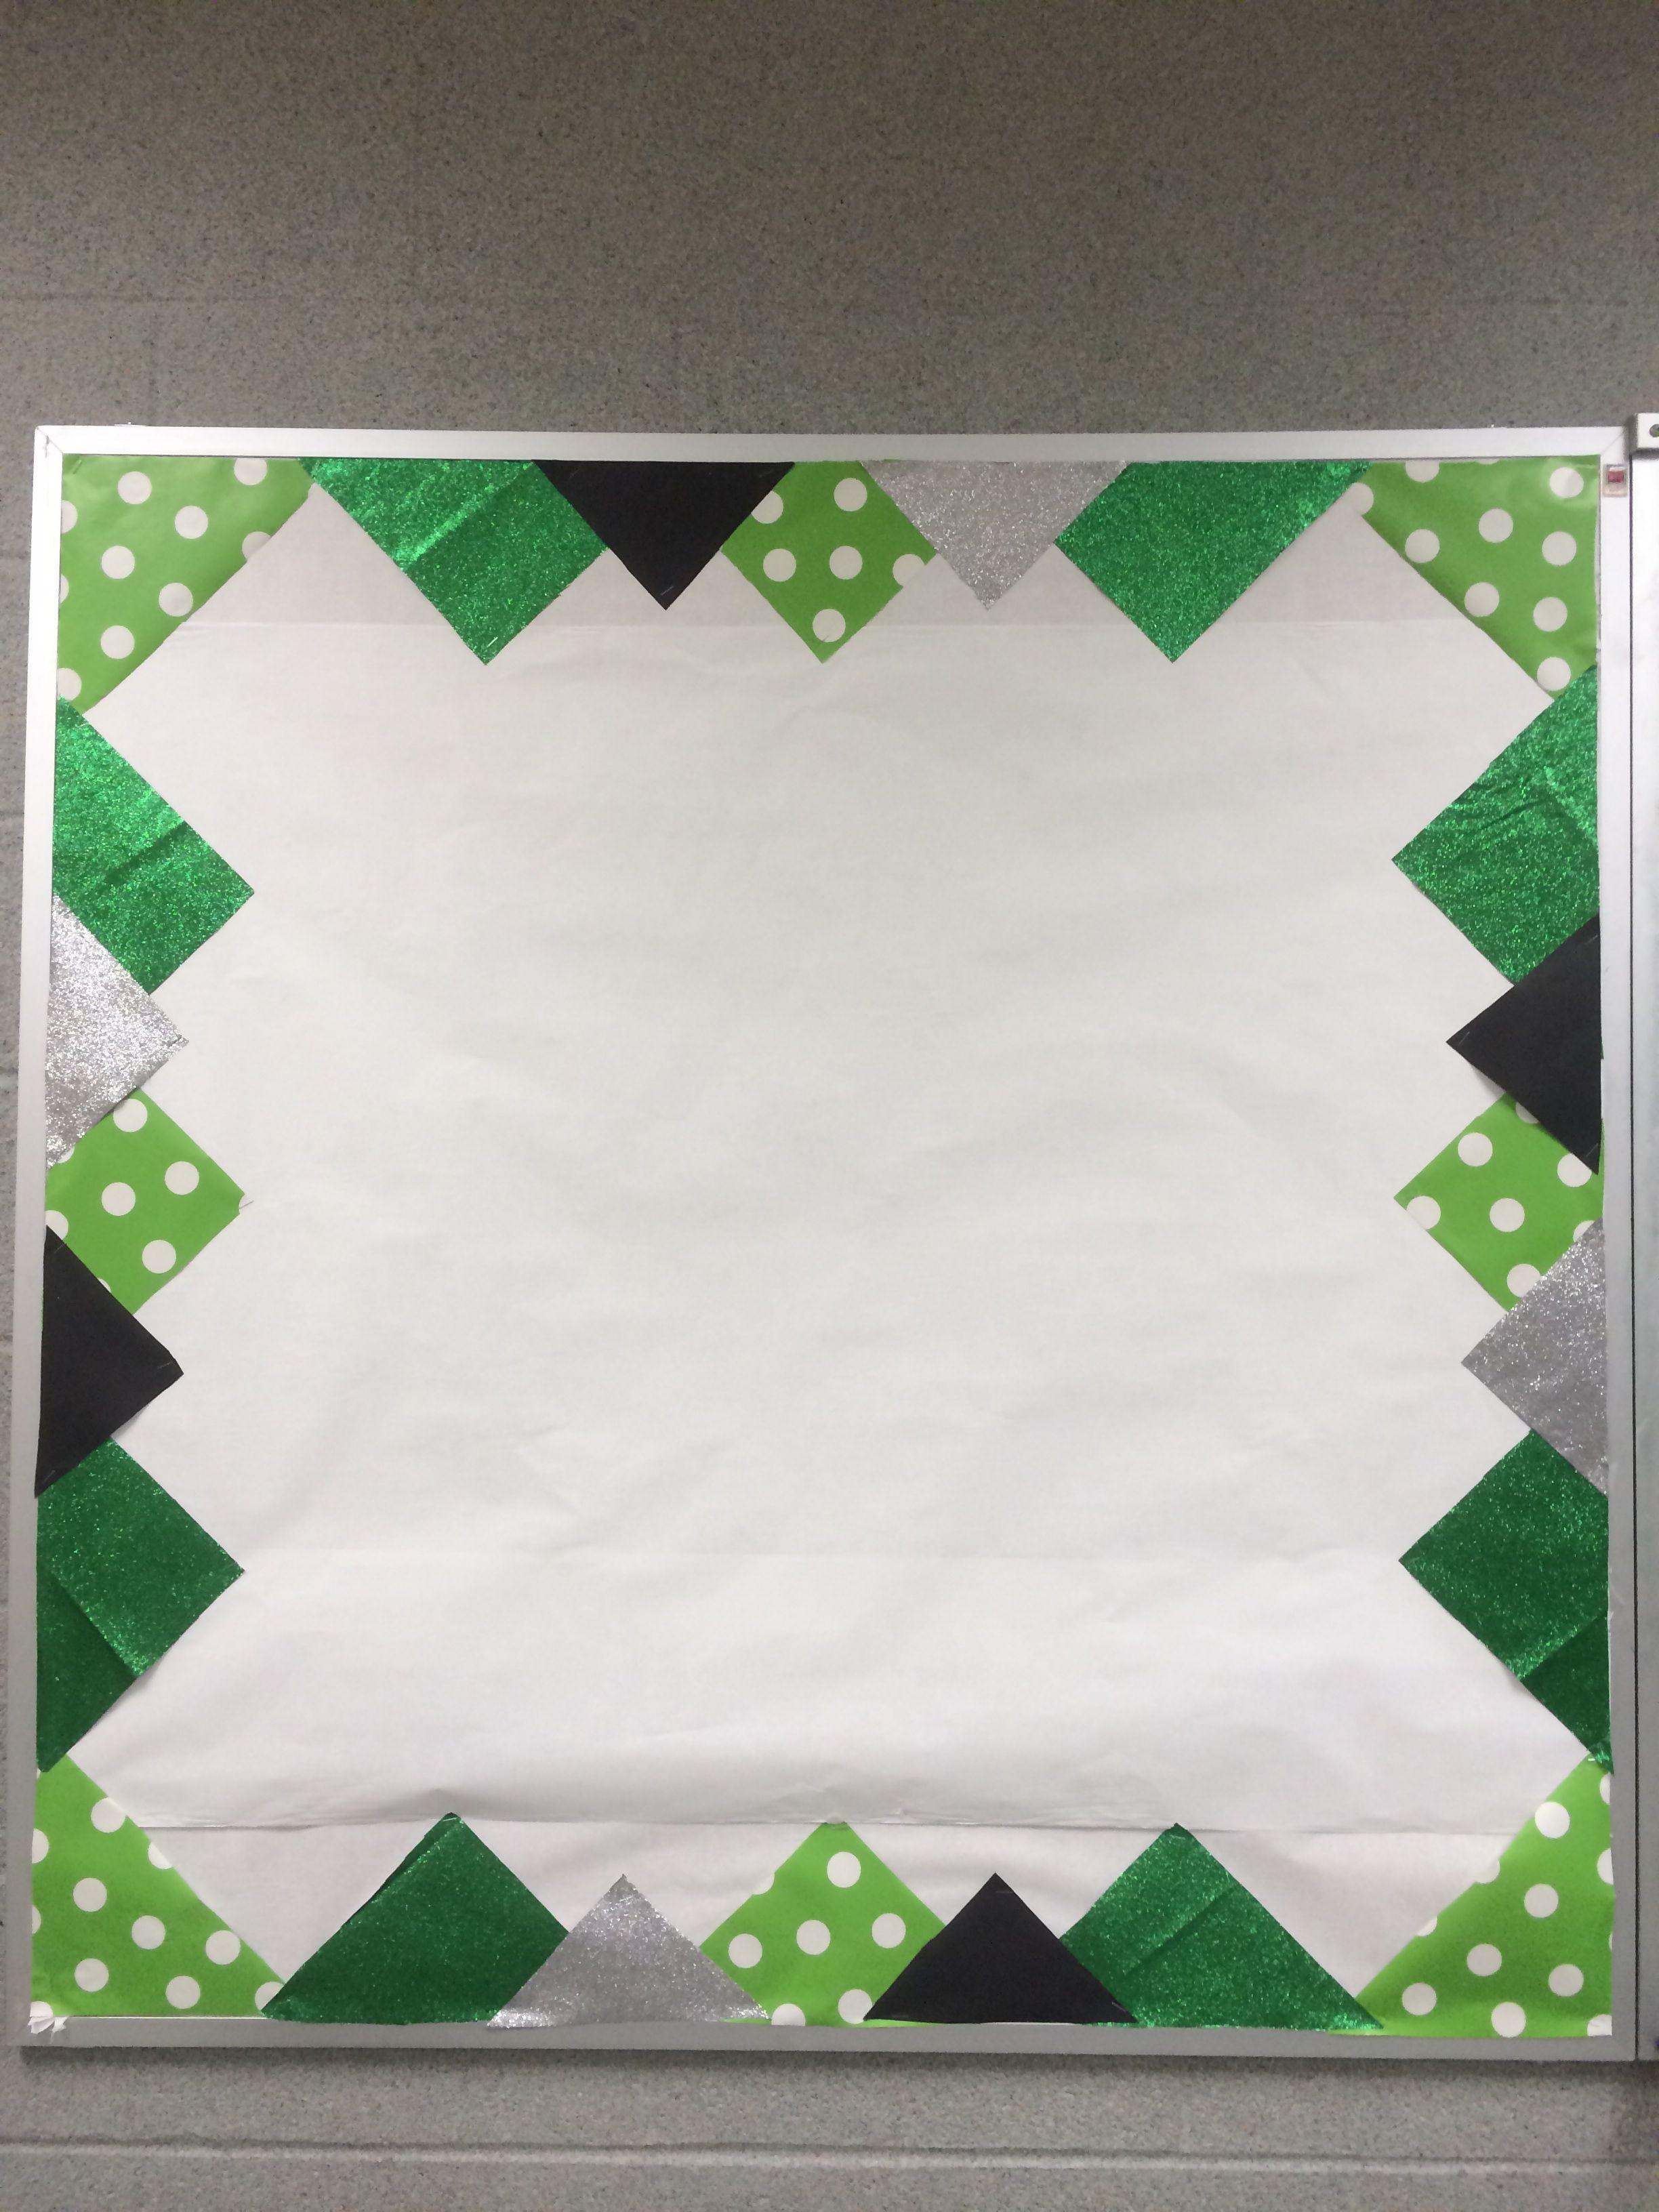 Classroom Border Design ~ Diy cool cork board ideas instalation photos ready